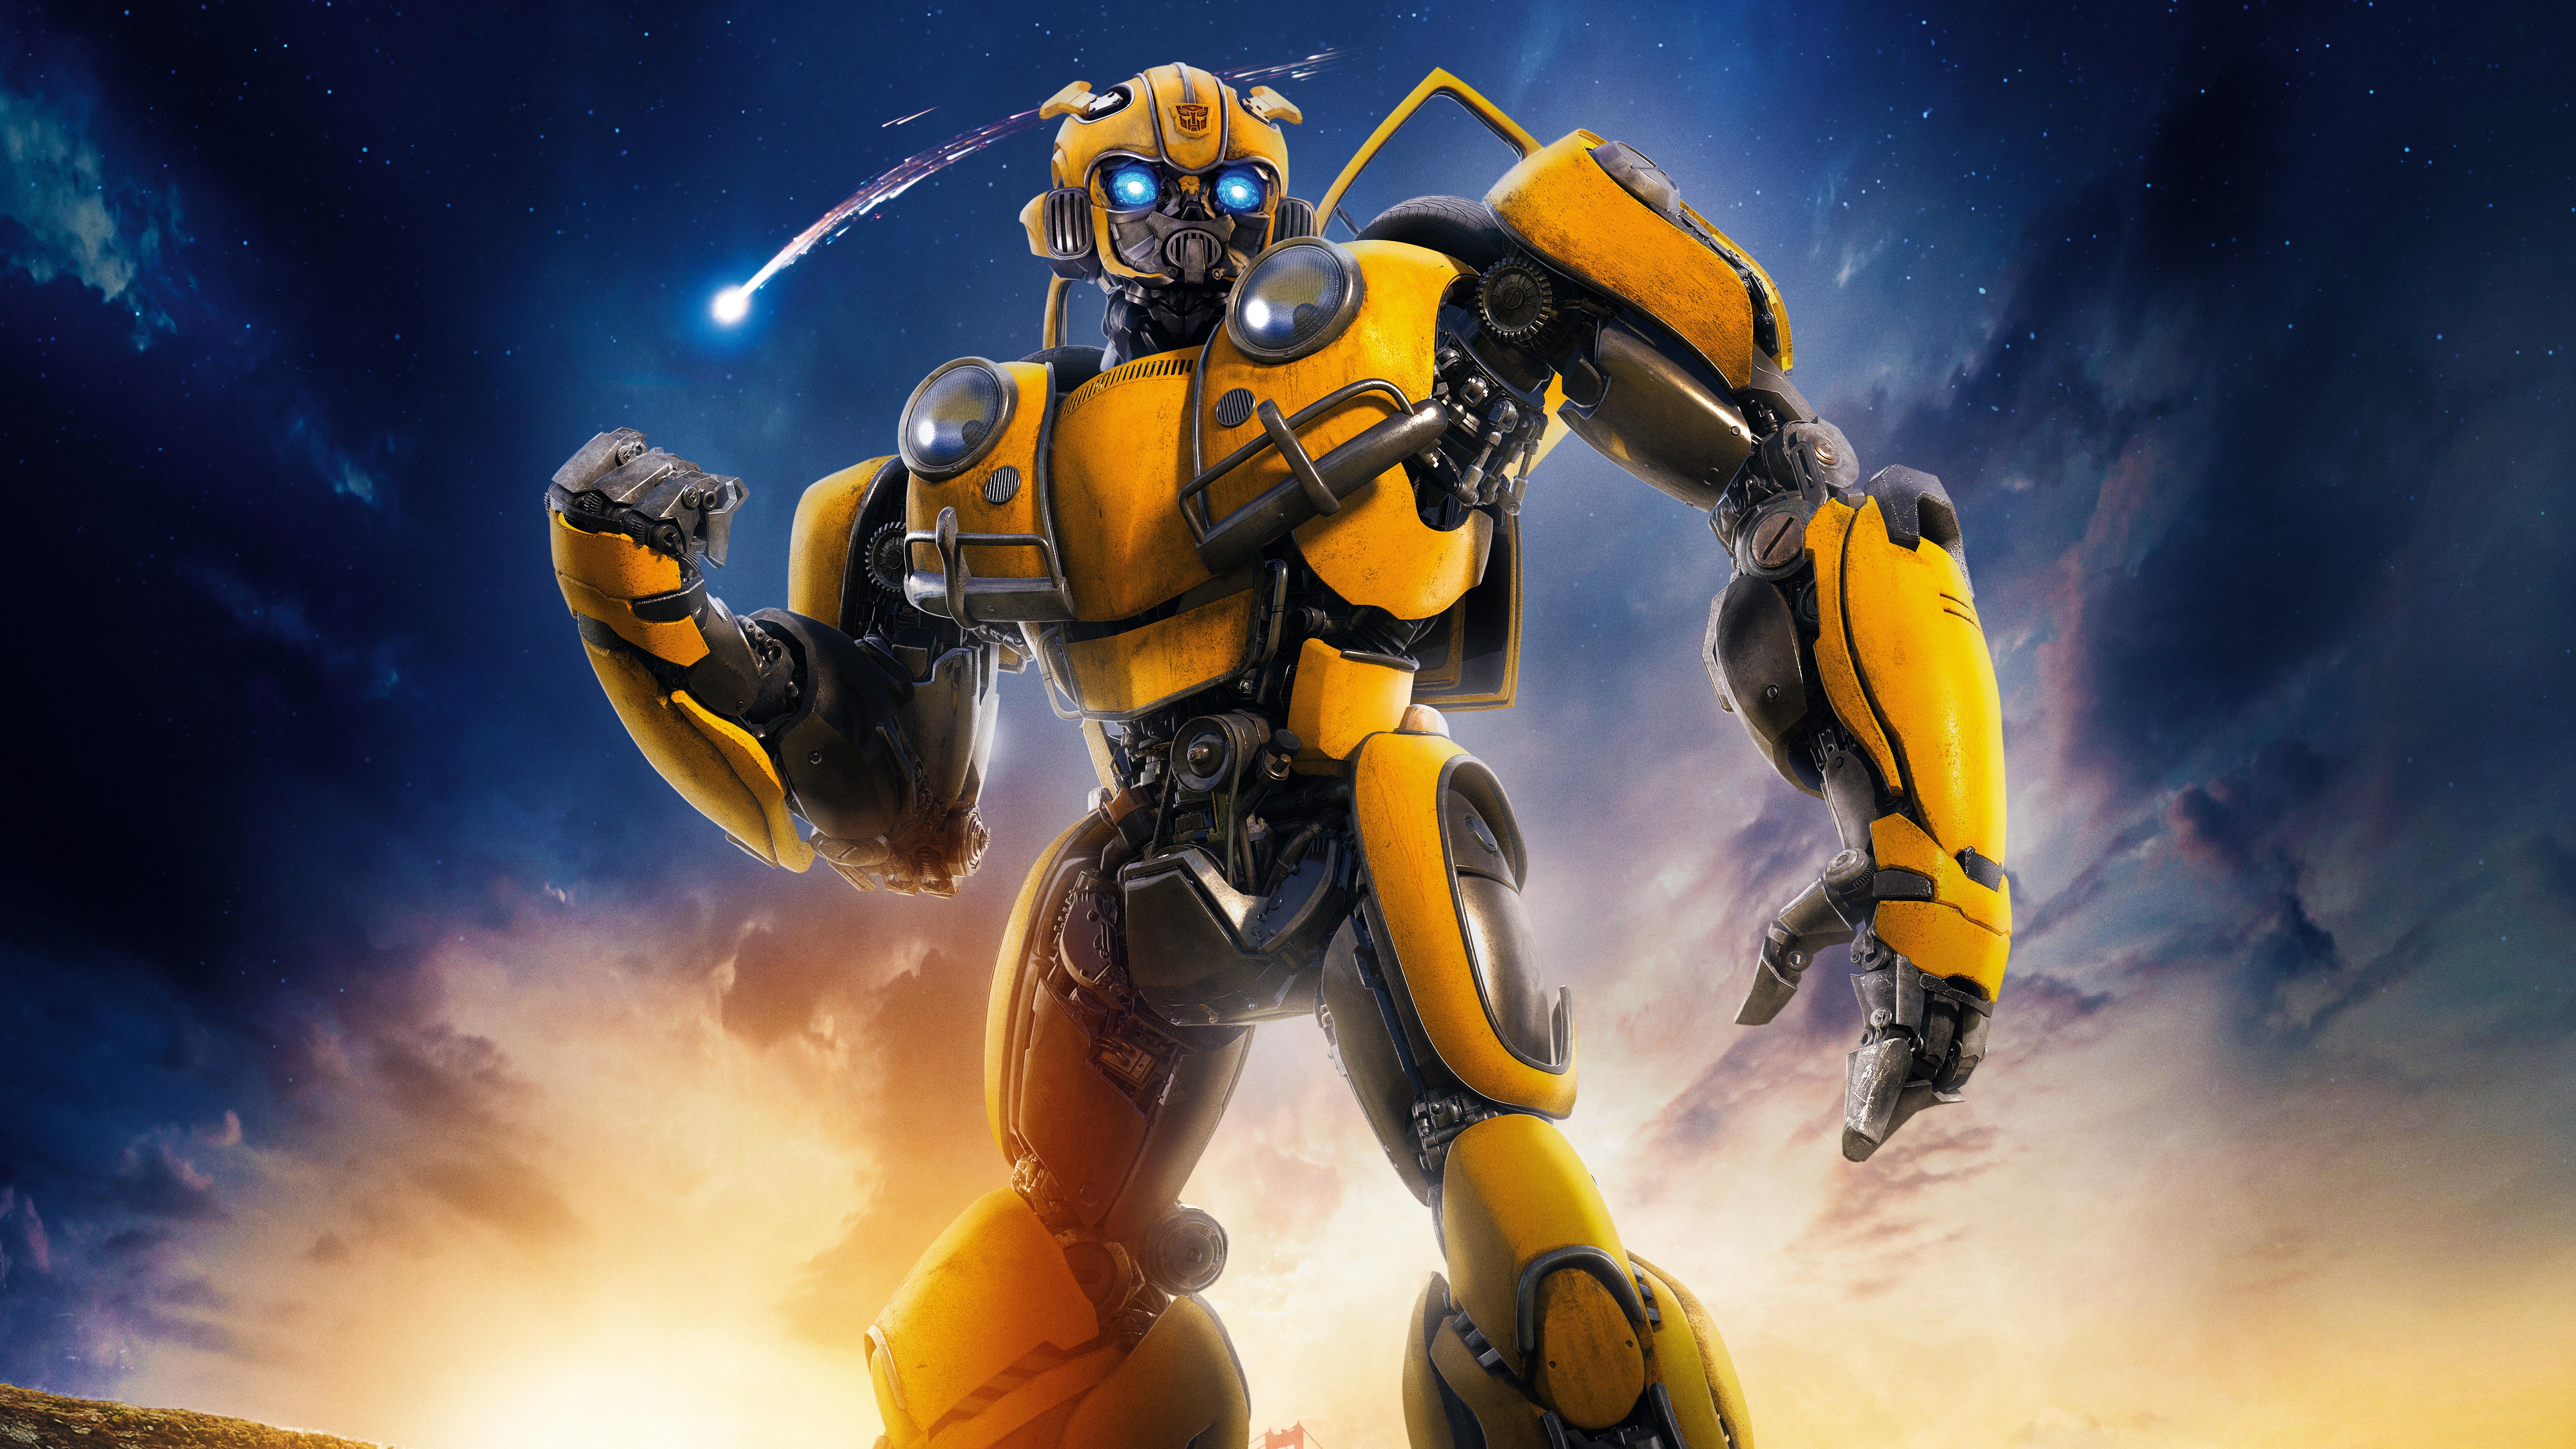 Bumblebee Movie 8k 2018 Hd Movies 4k Wallpapers Images